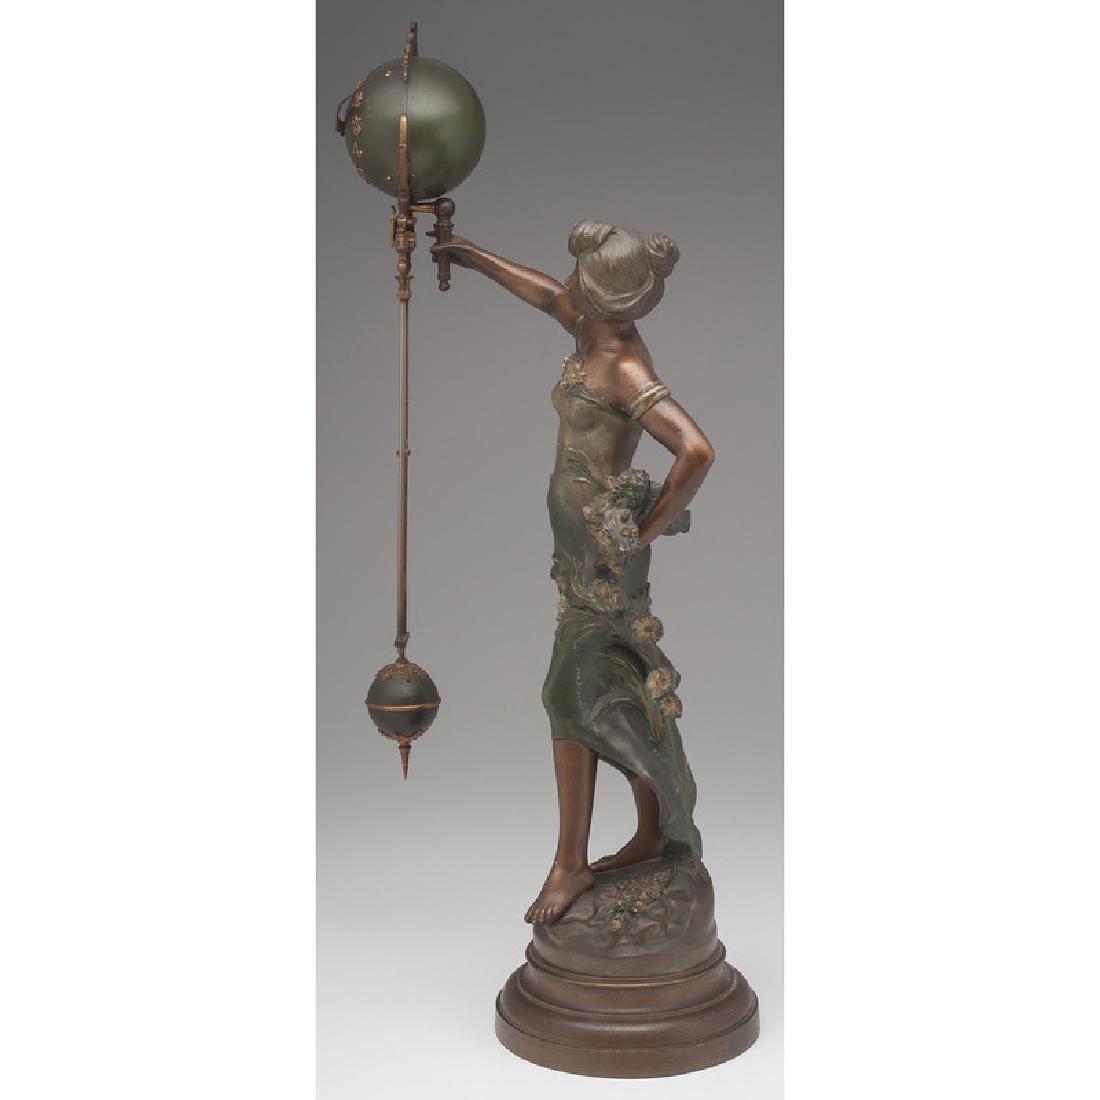 Ansonia  Swing Clock, Arcadia - 2